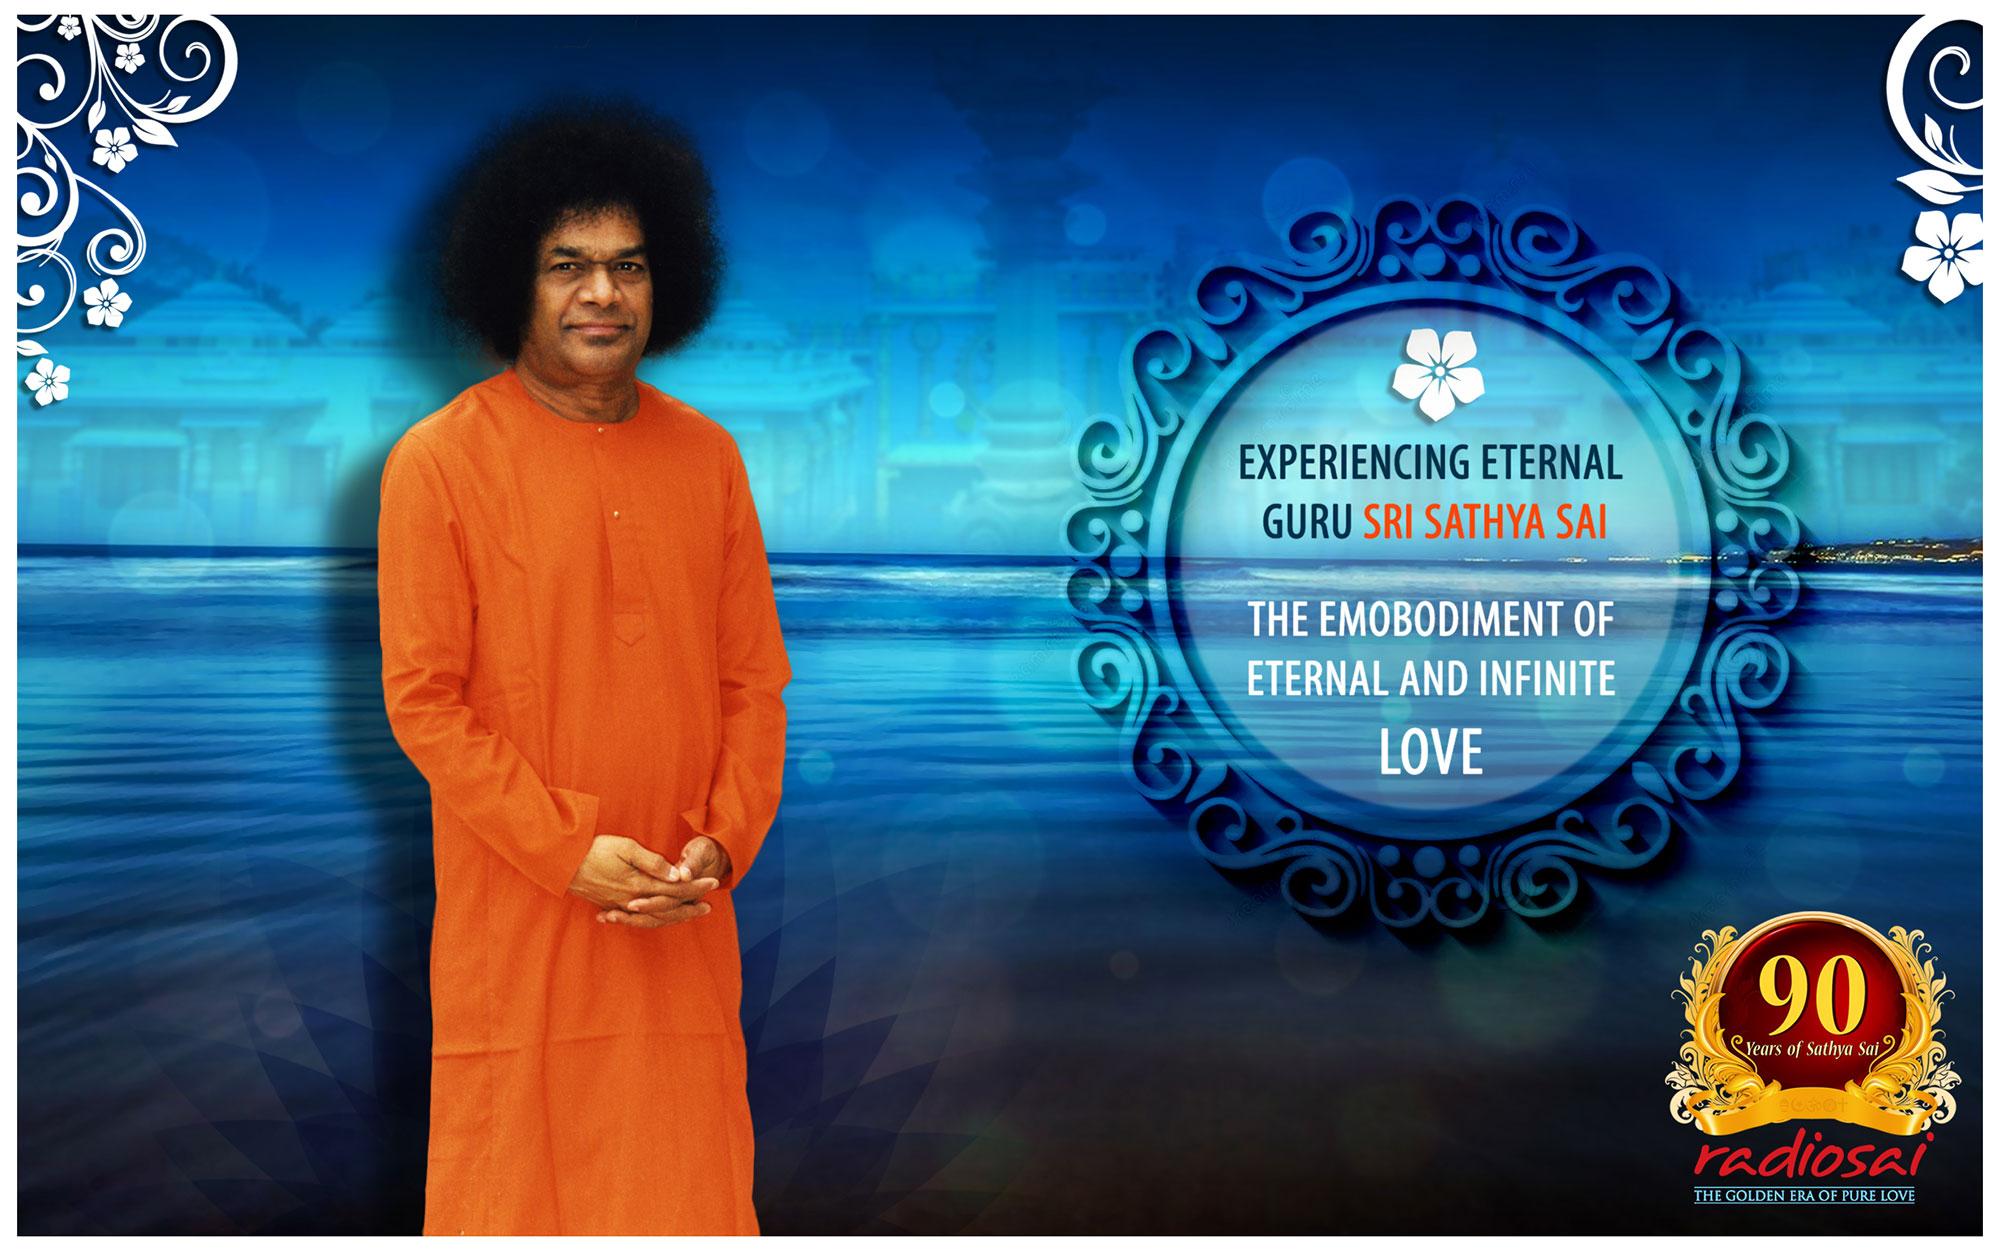 Eternal-Guru-Sai-2015-Radiosai